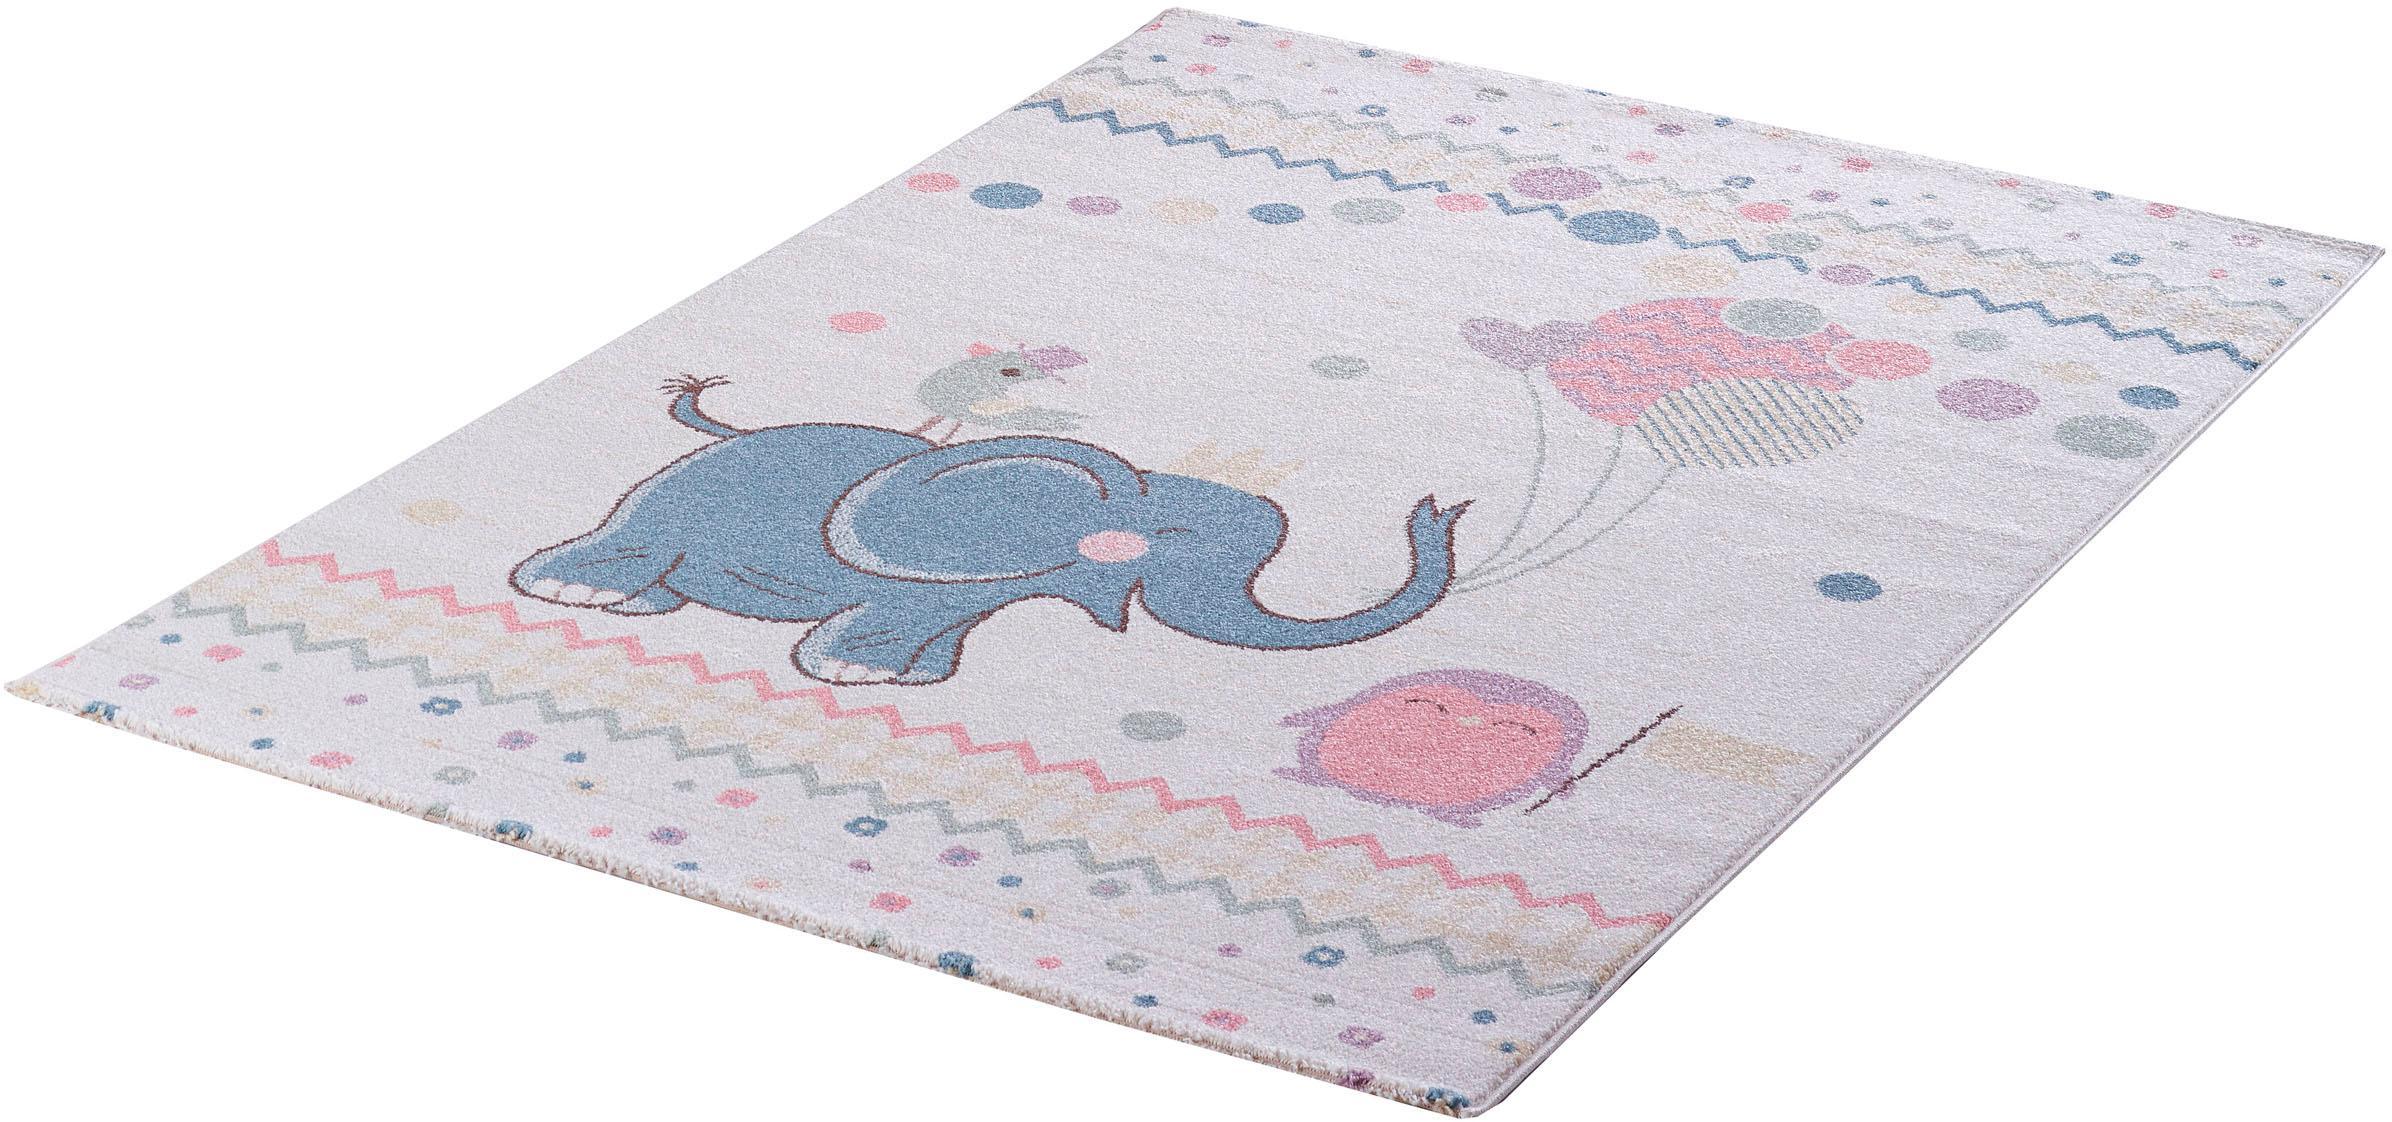 Kinderteppich Luna Kids 4611 Sanat Teppiche rechteckig Höhe 12 mm maschinell gewebt